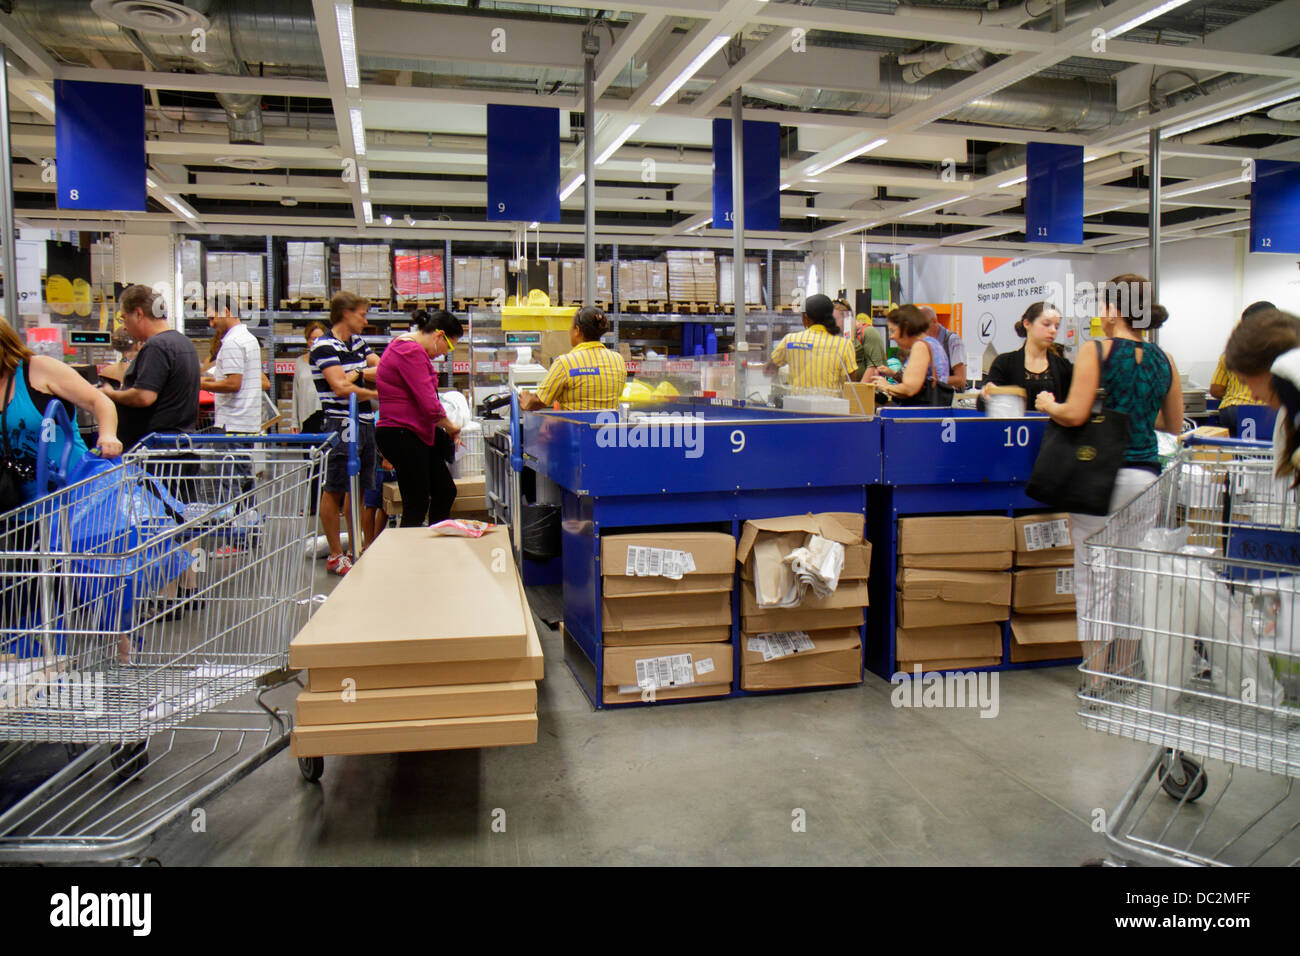 Alamy Fotos De Ikea Stockamp; Imágenes Customers xeroCBd